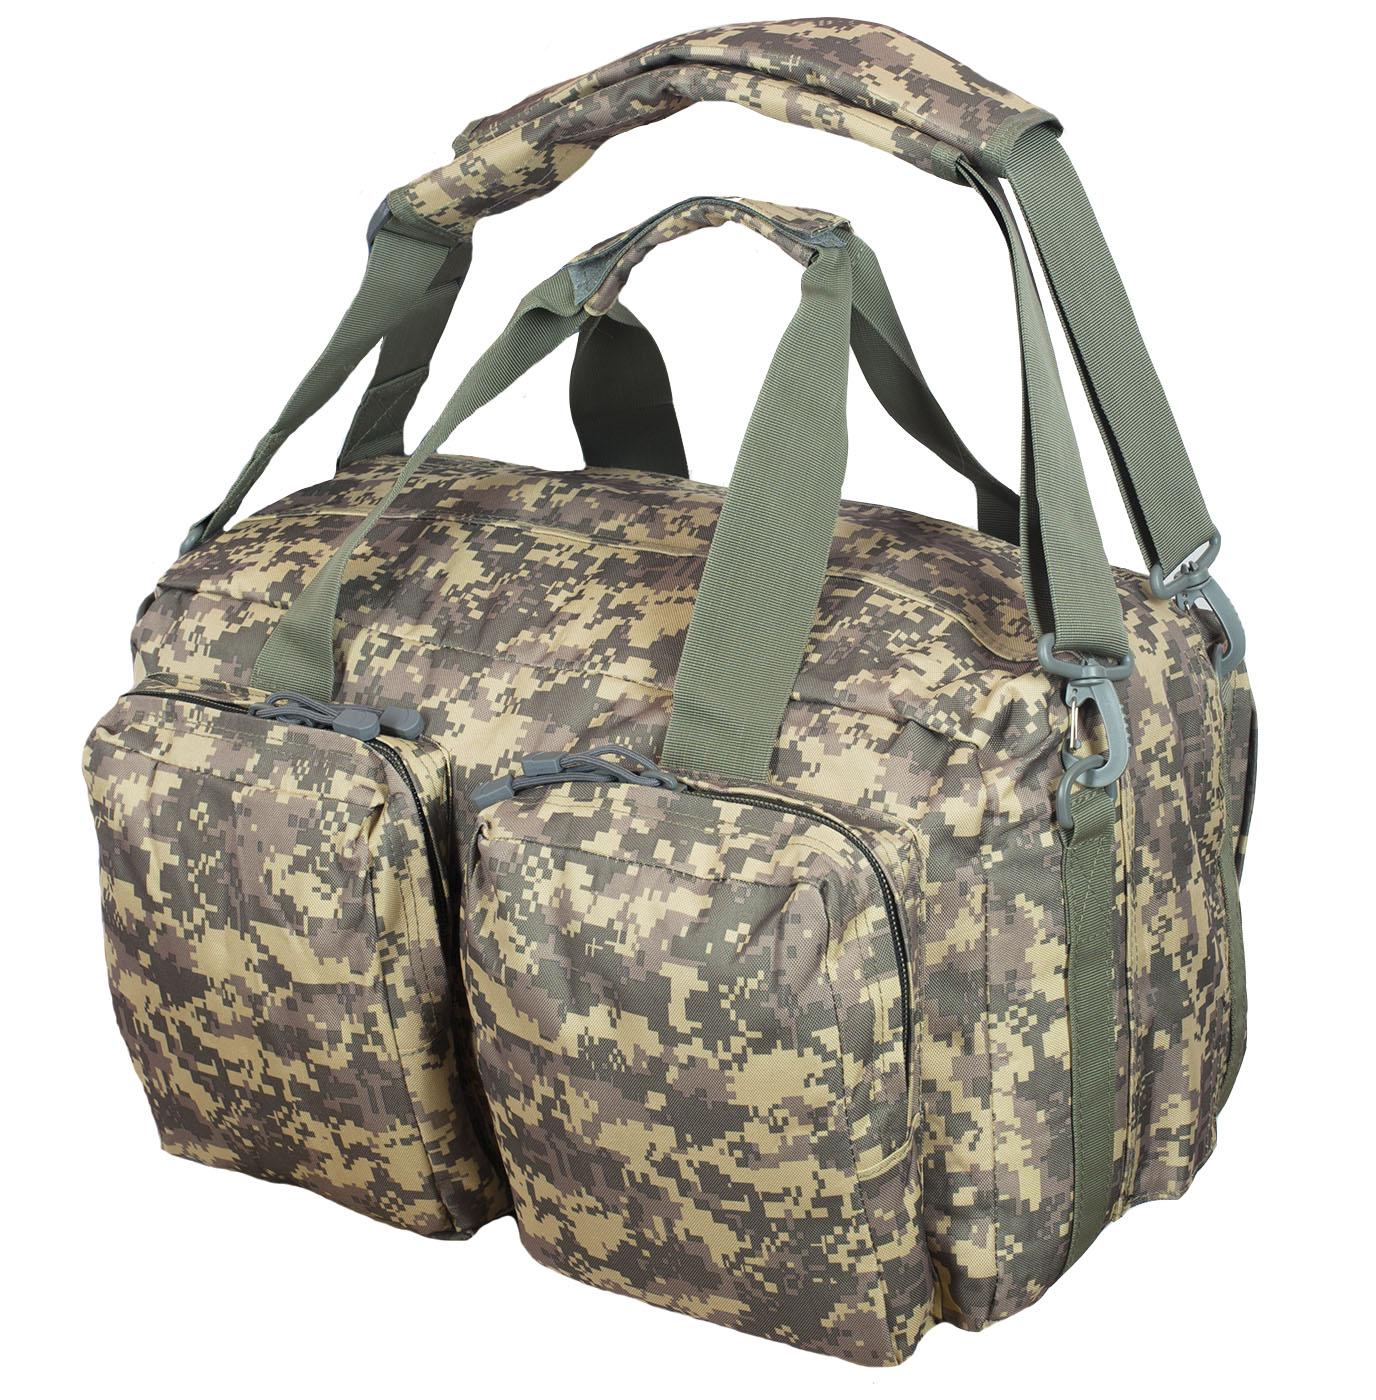 Камуфляжная походная сумка Русская Охота - заказать онлайн